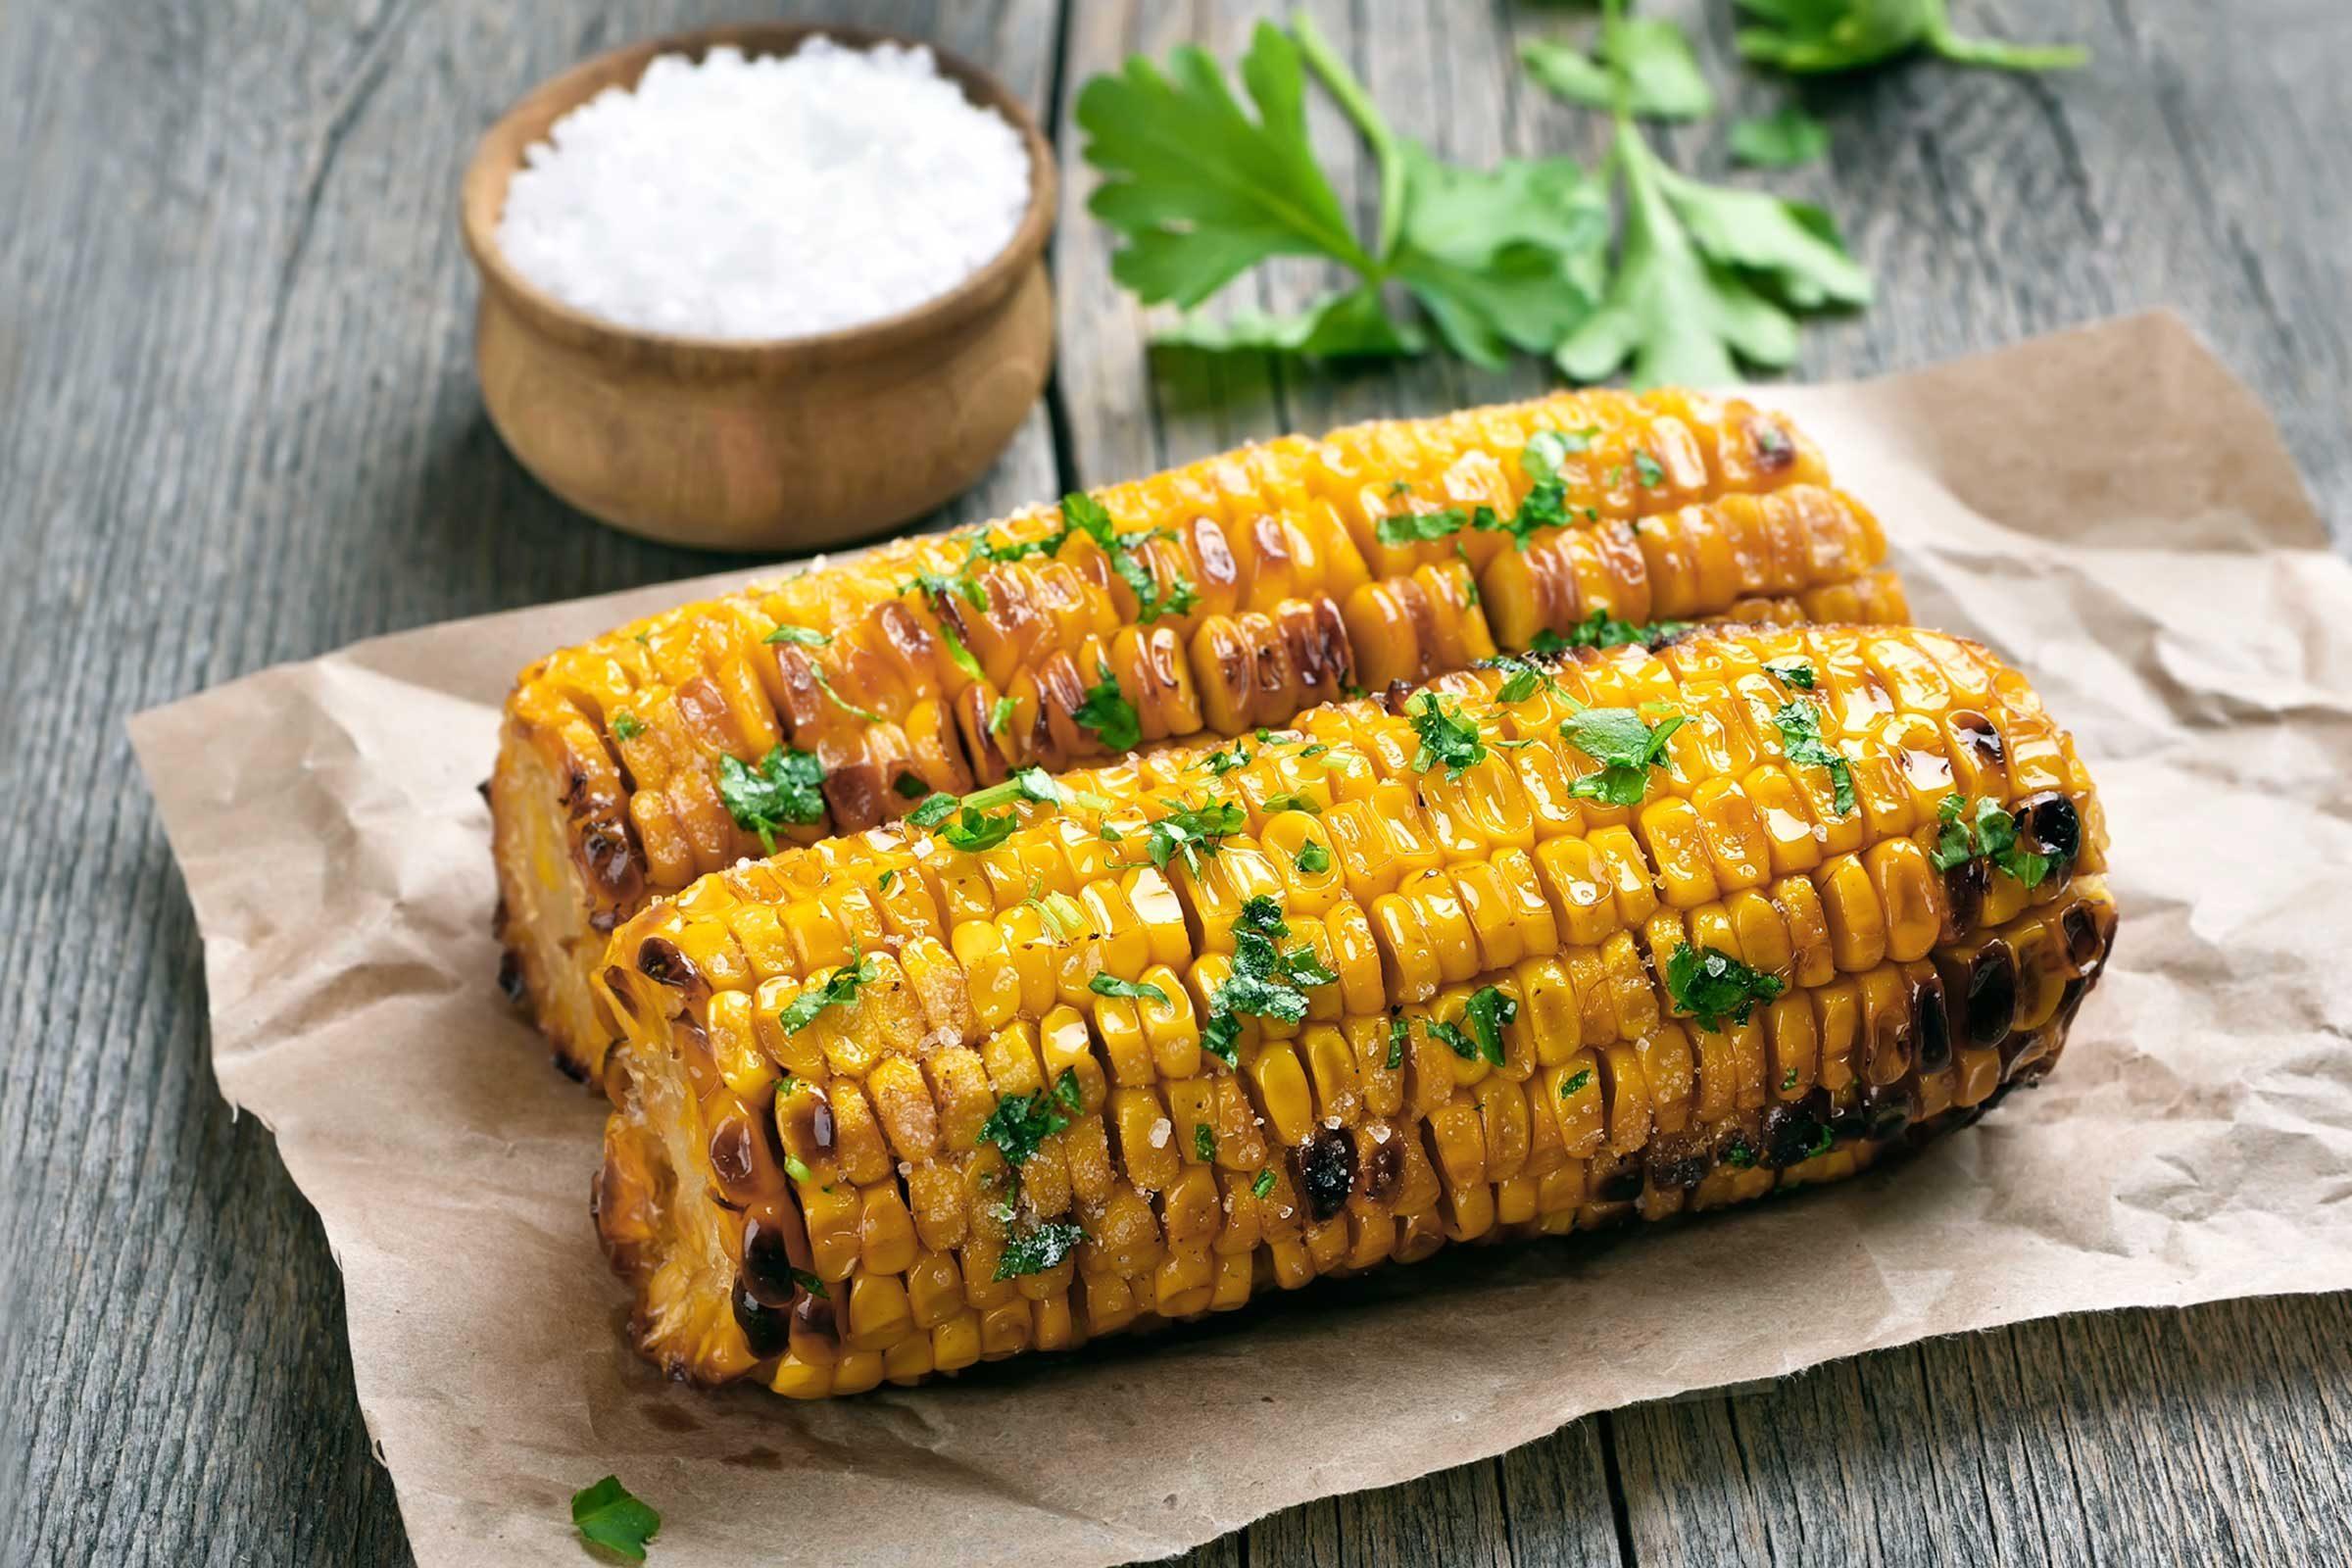 Milk boosts corn on the cob flavor